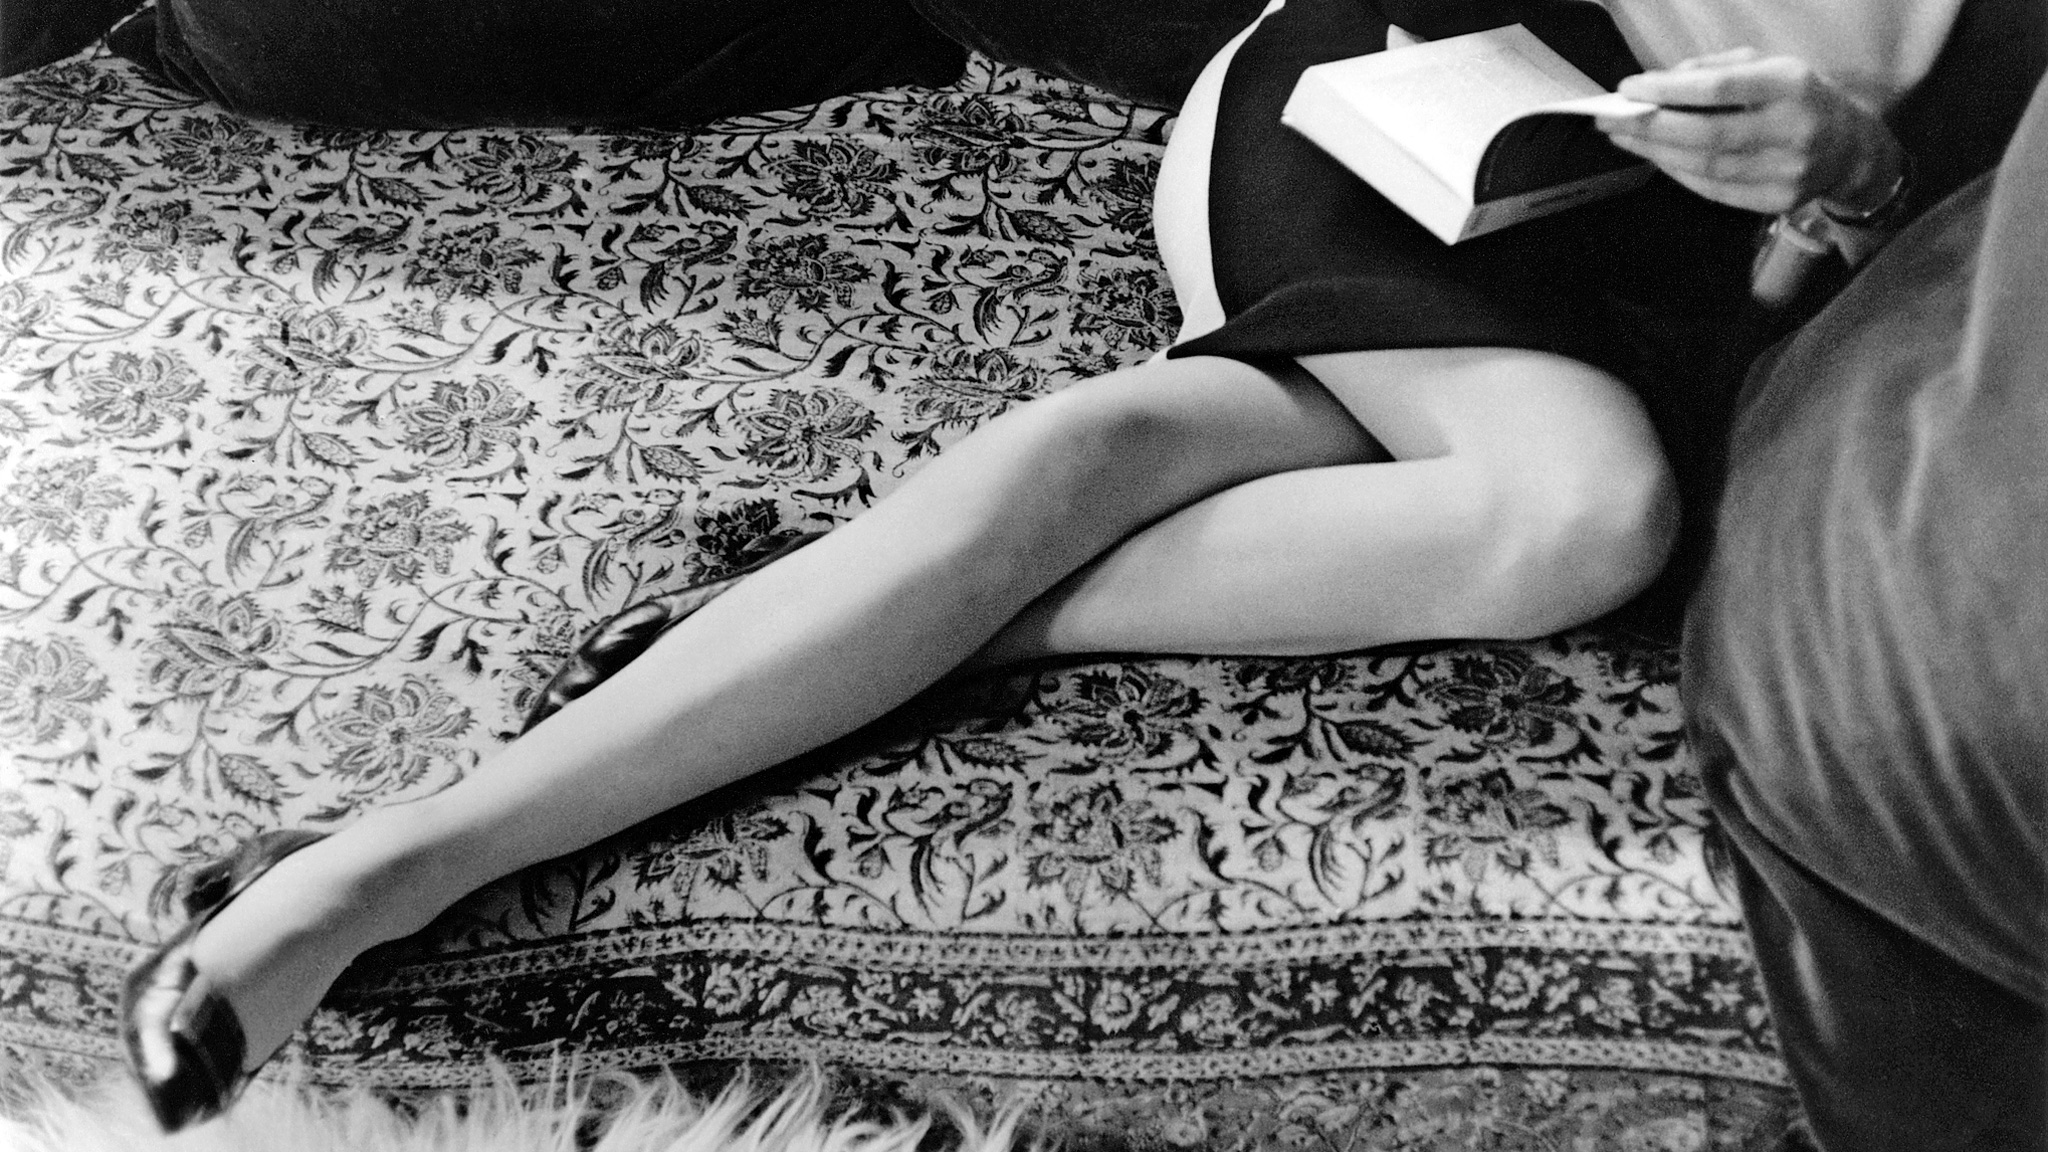 33262405ba3 Henri Cartier-Bresson at the Centre Pompidou